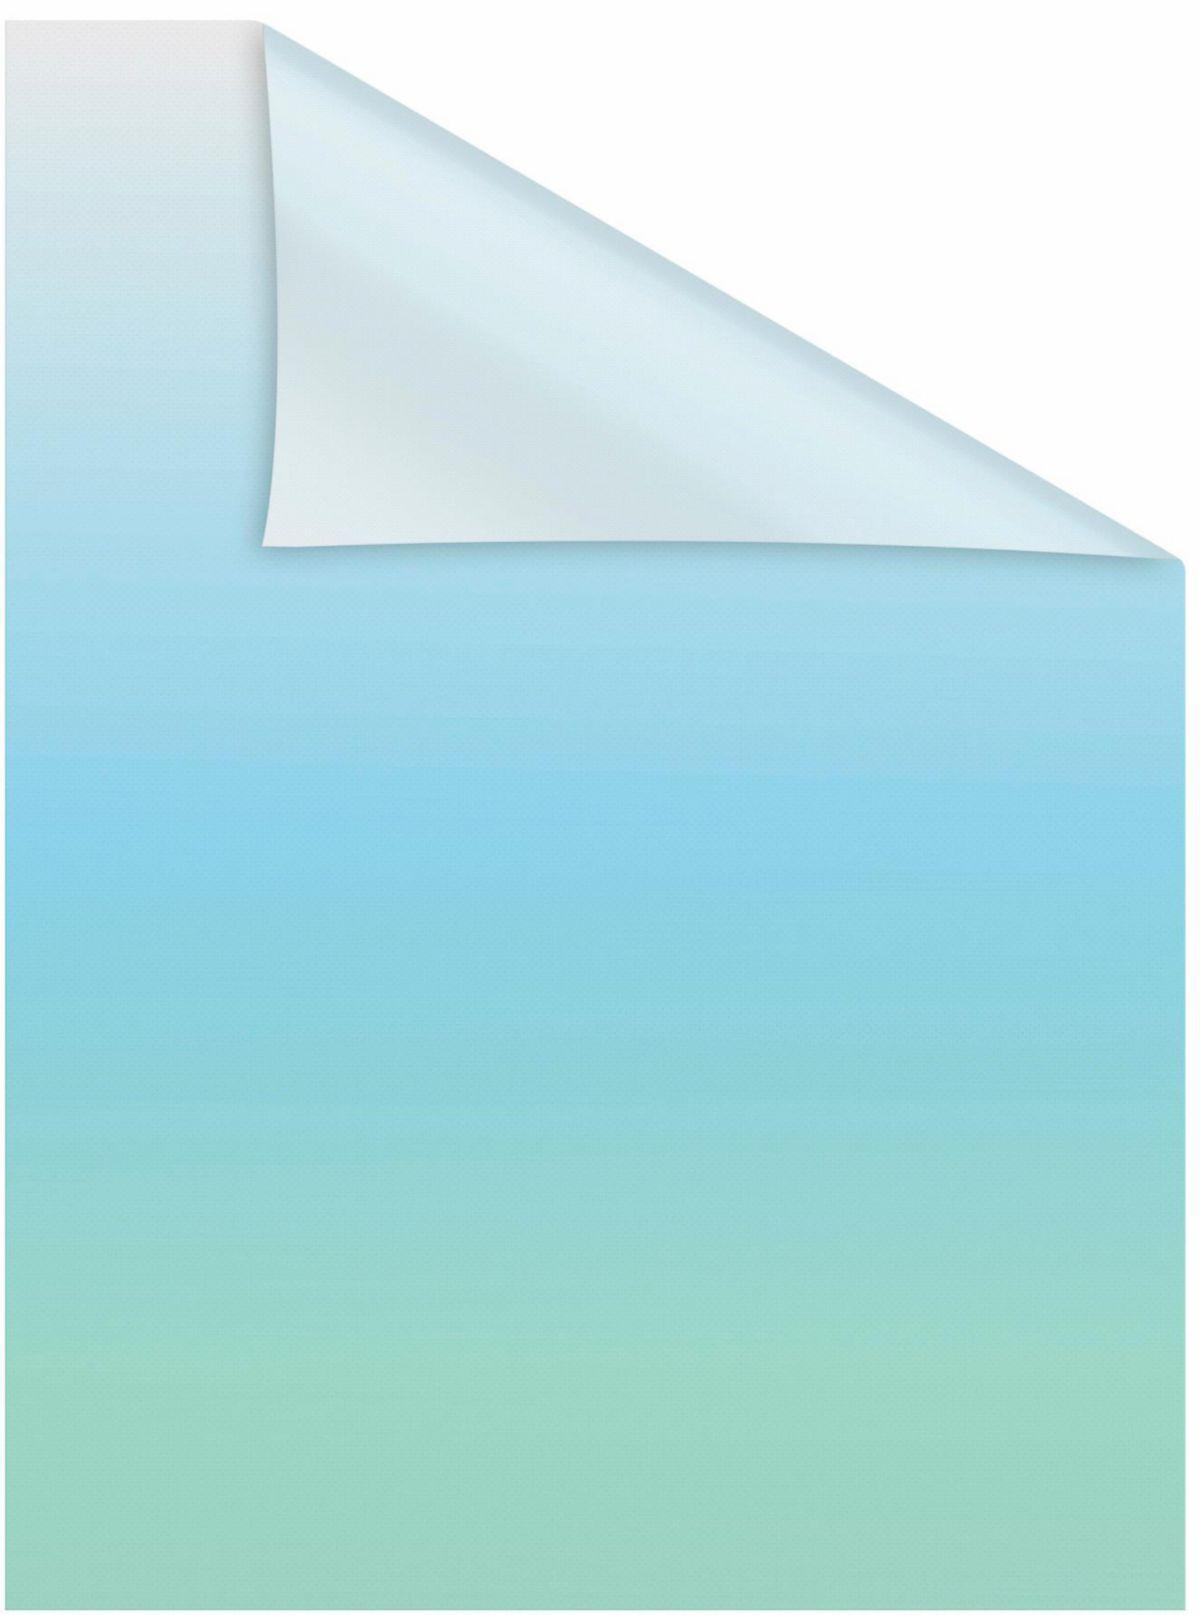 Fensterfolie, »Ombre Petrol«, LICHTBLICK, blick...